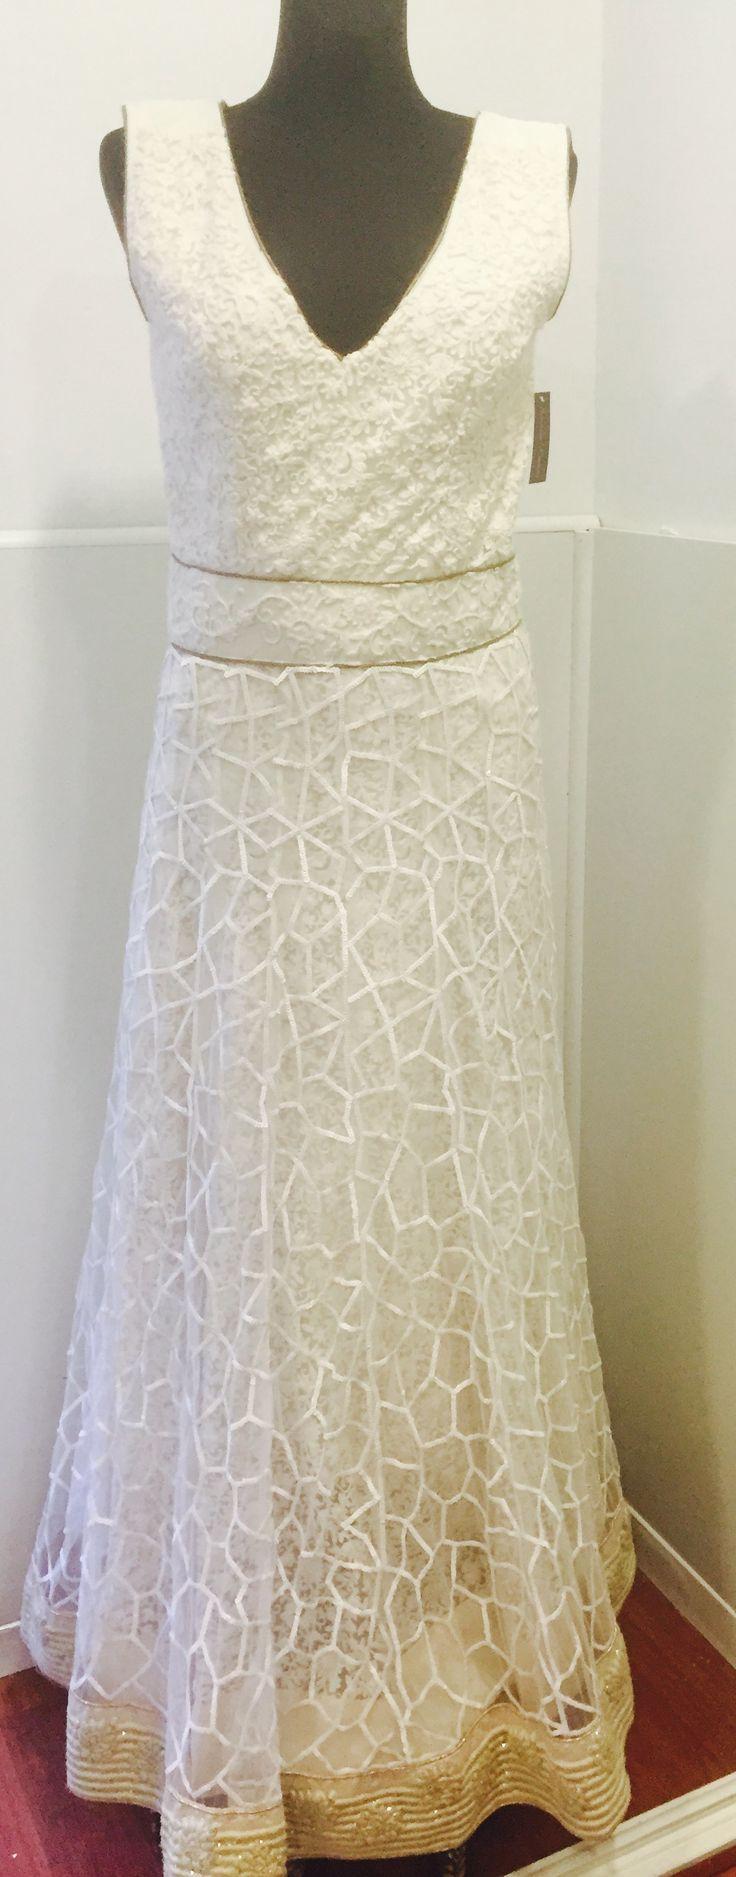 Vestido de Novia made in India bordado a mano